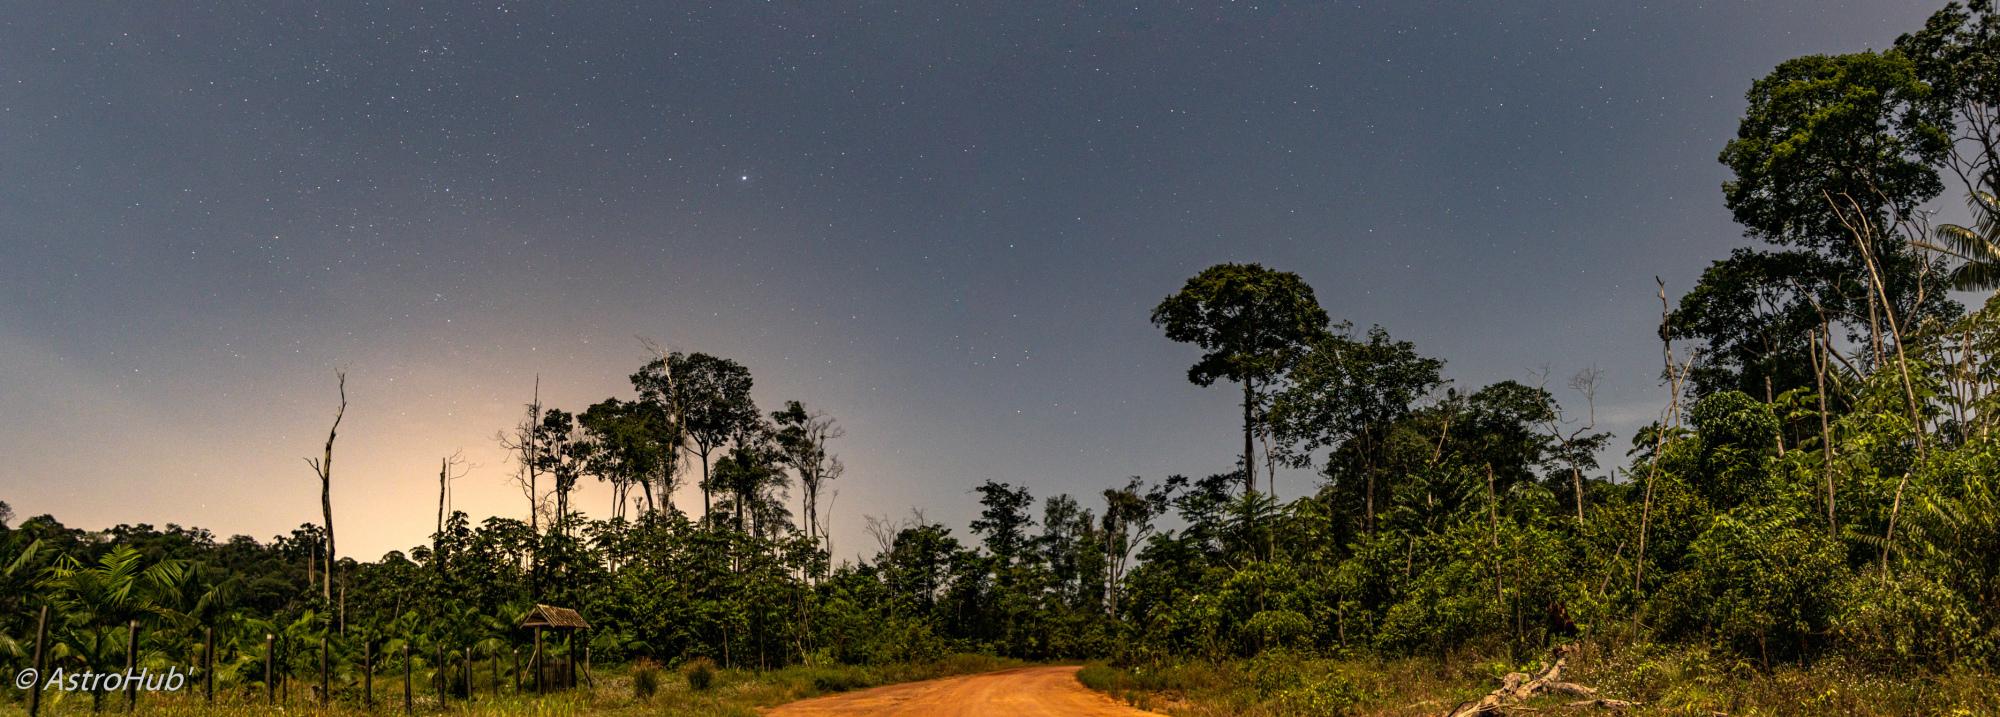 IMG_4488-Panorama.jpg